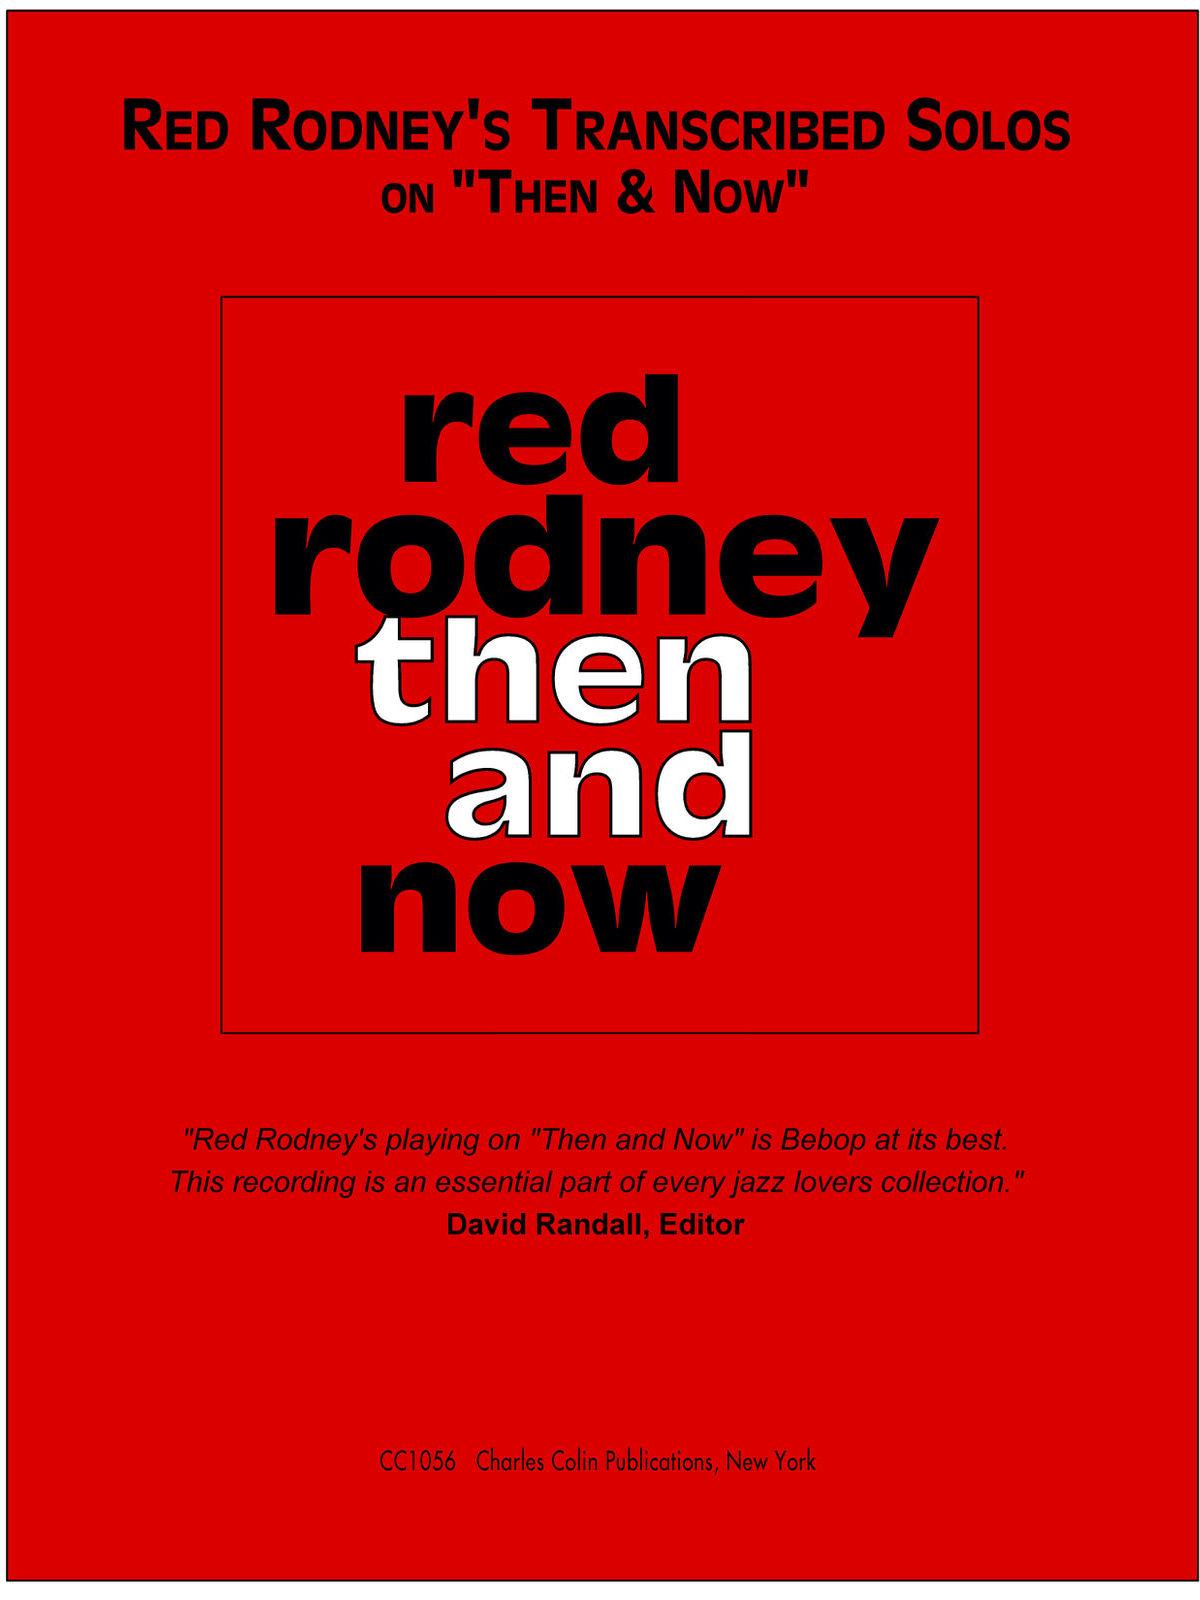 Red Rodney Trumpet Solos